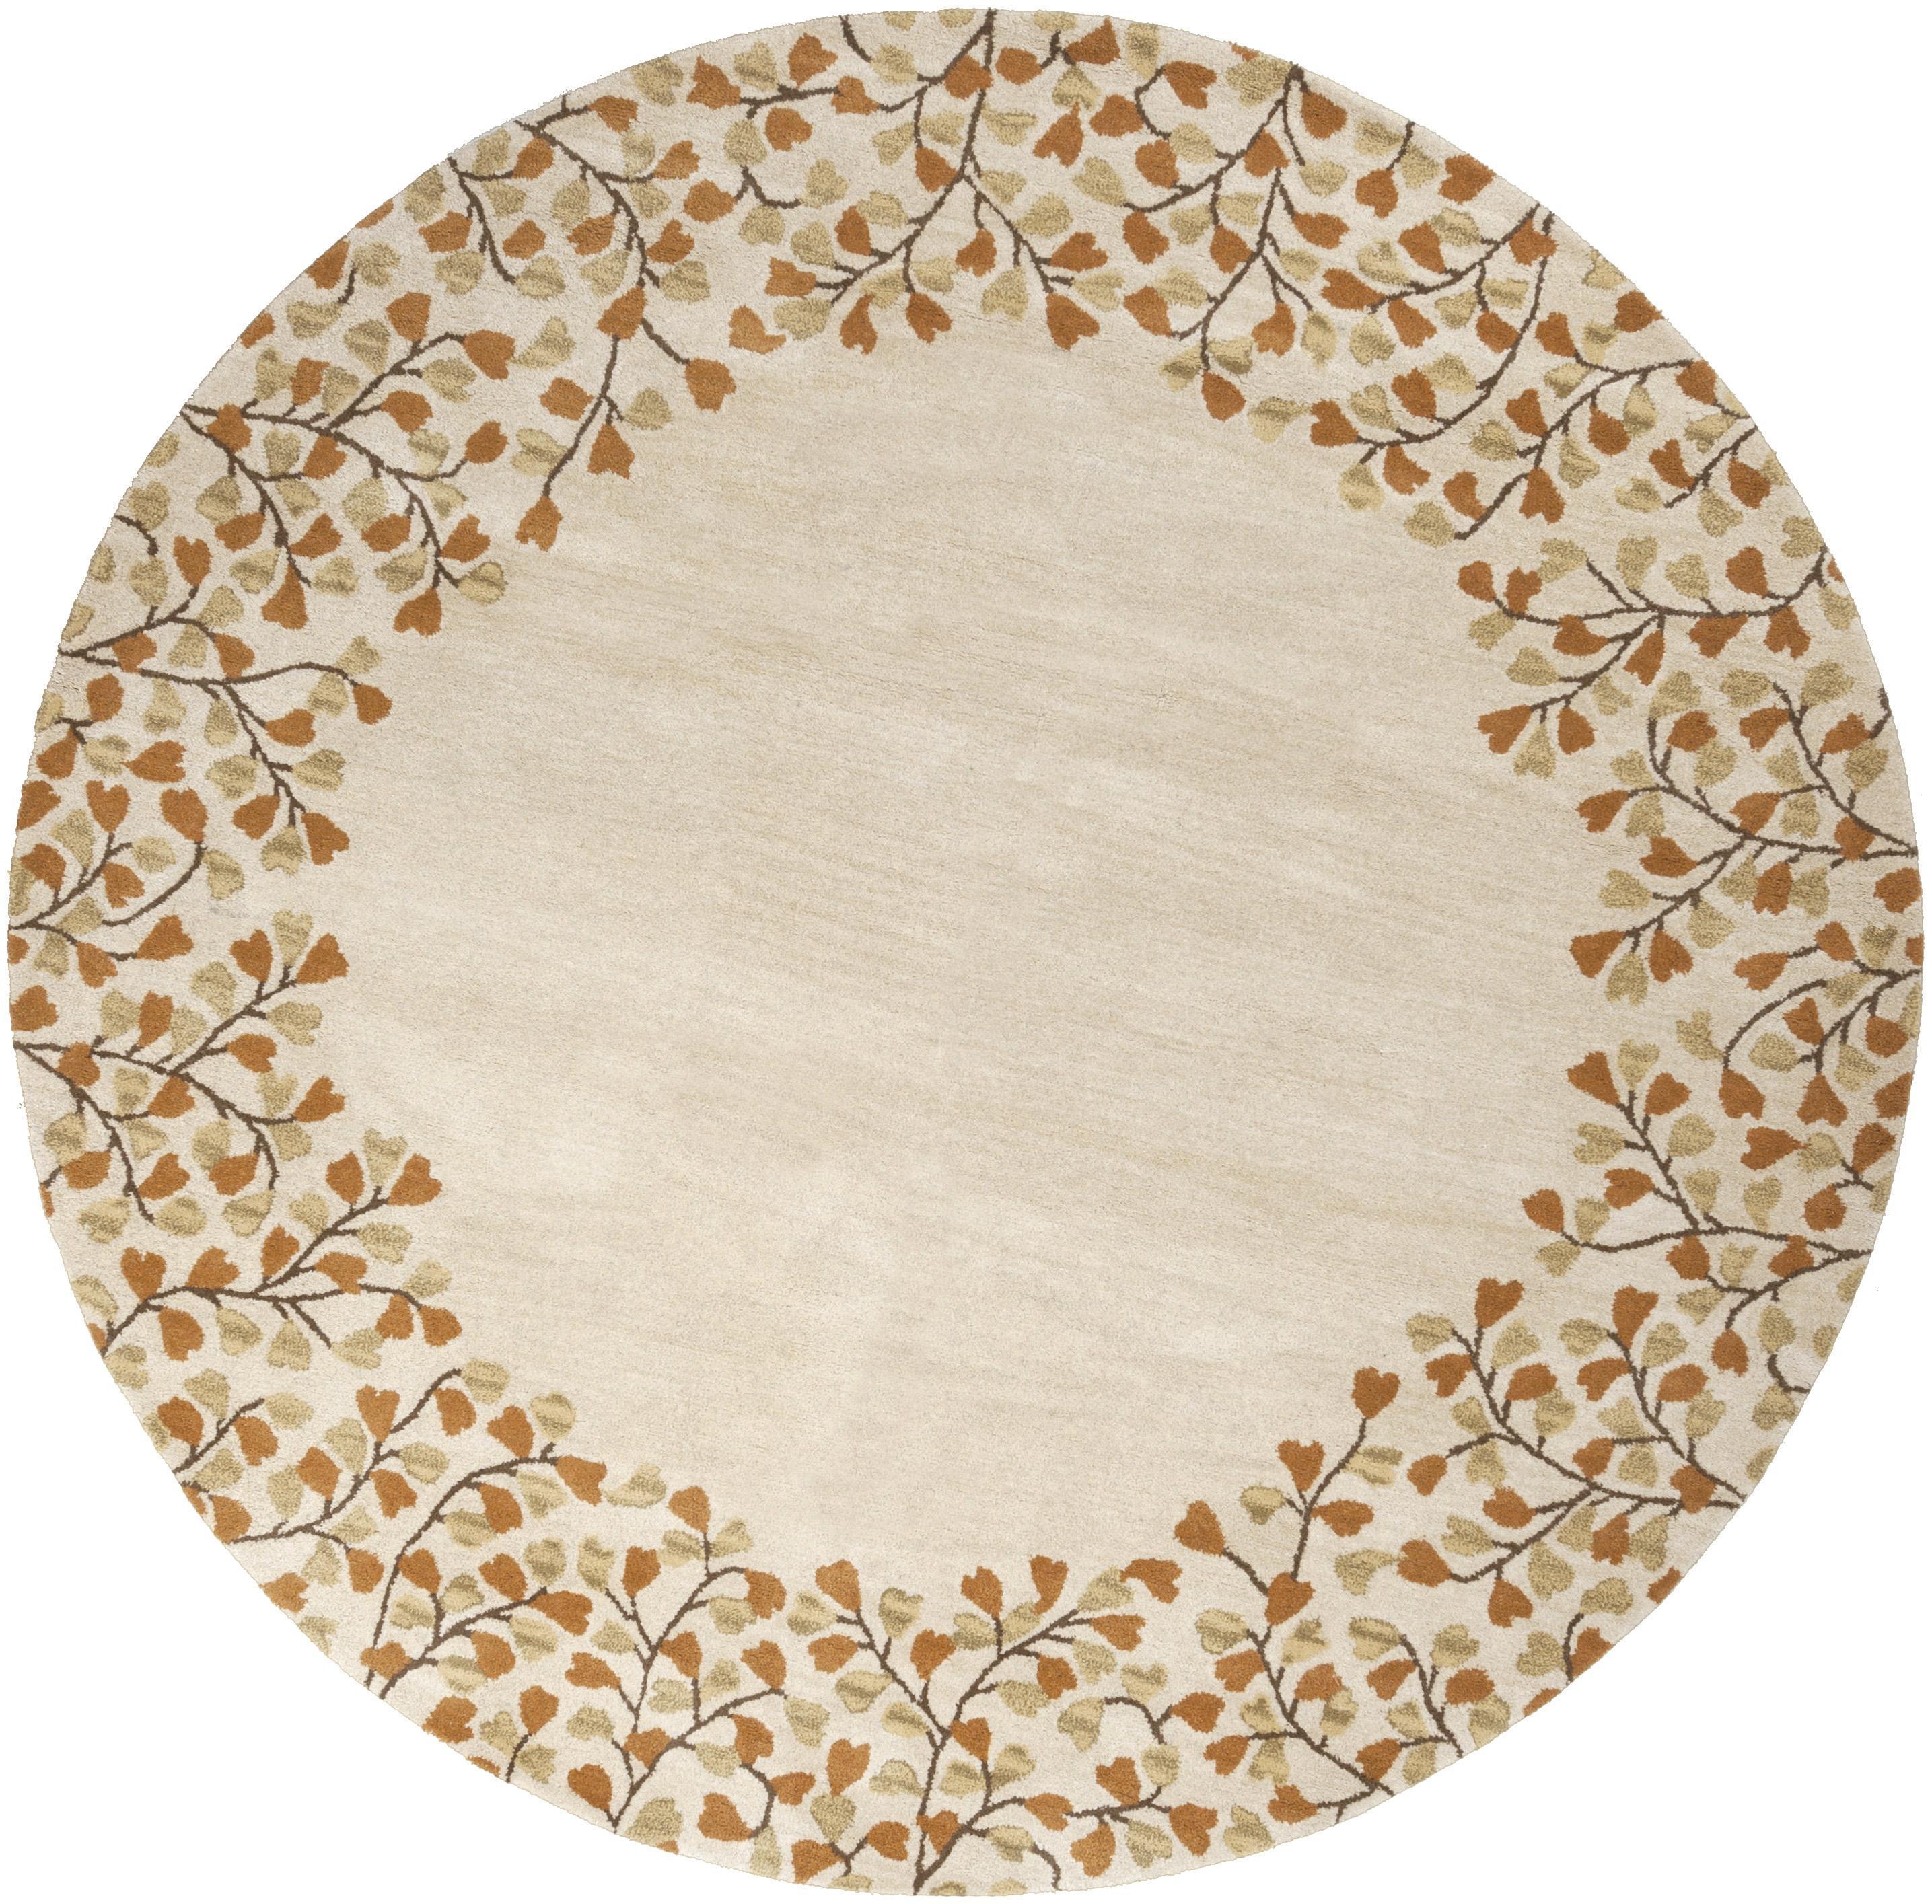 Surya Rugs Athena 8' Round - Item Number: ATH5118-8RD